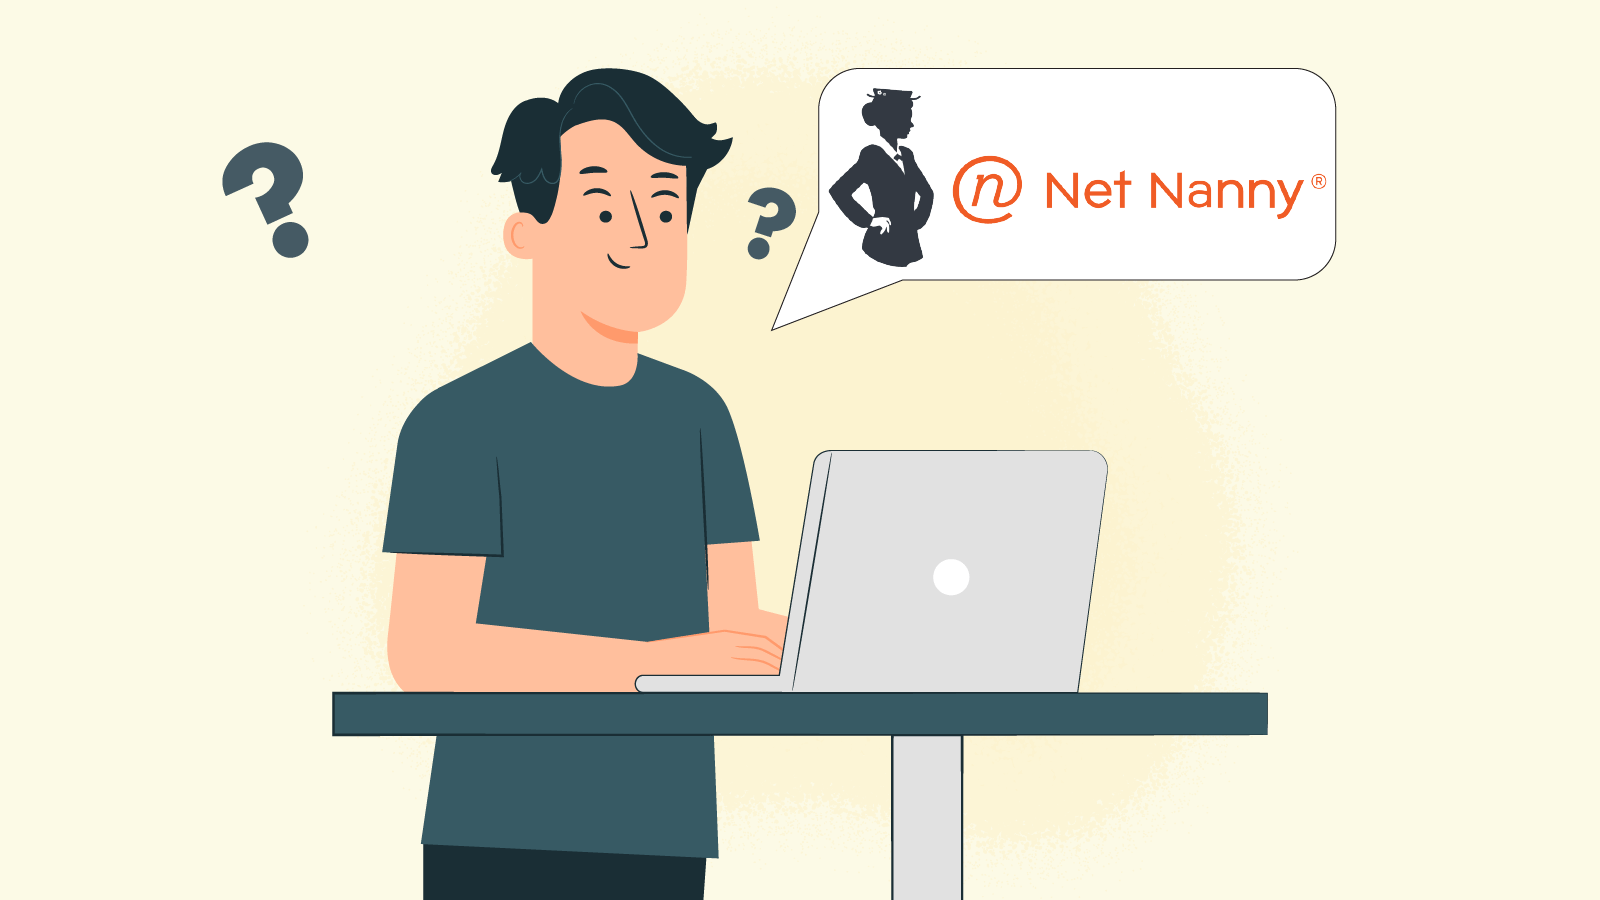 How Do I Download Net Nanny